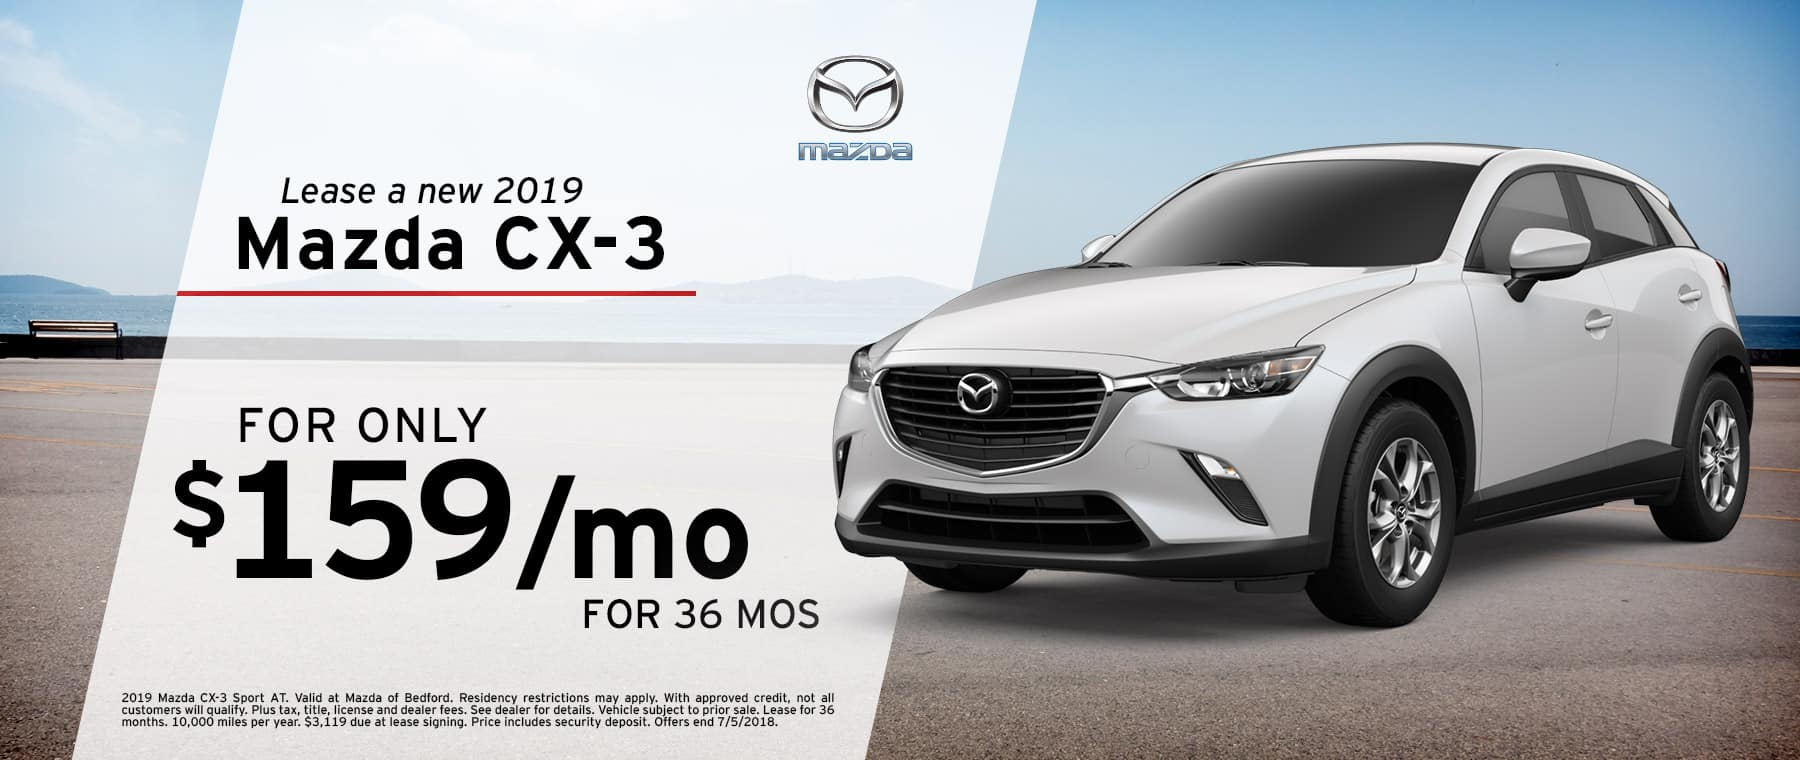 Mazda Bedford Specials | 2019 Mazda CX-3